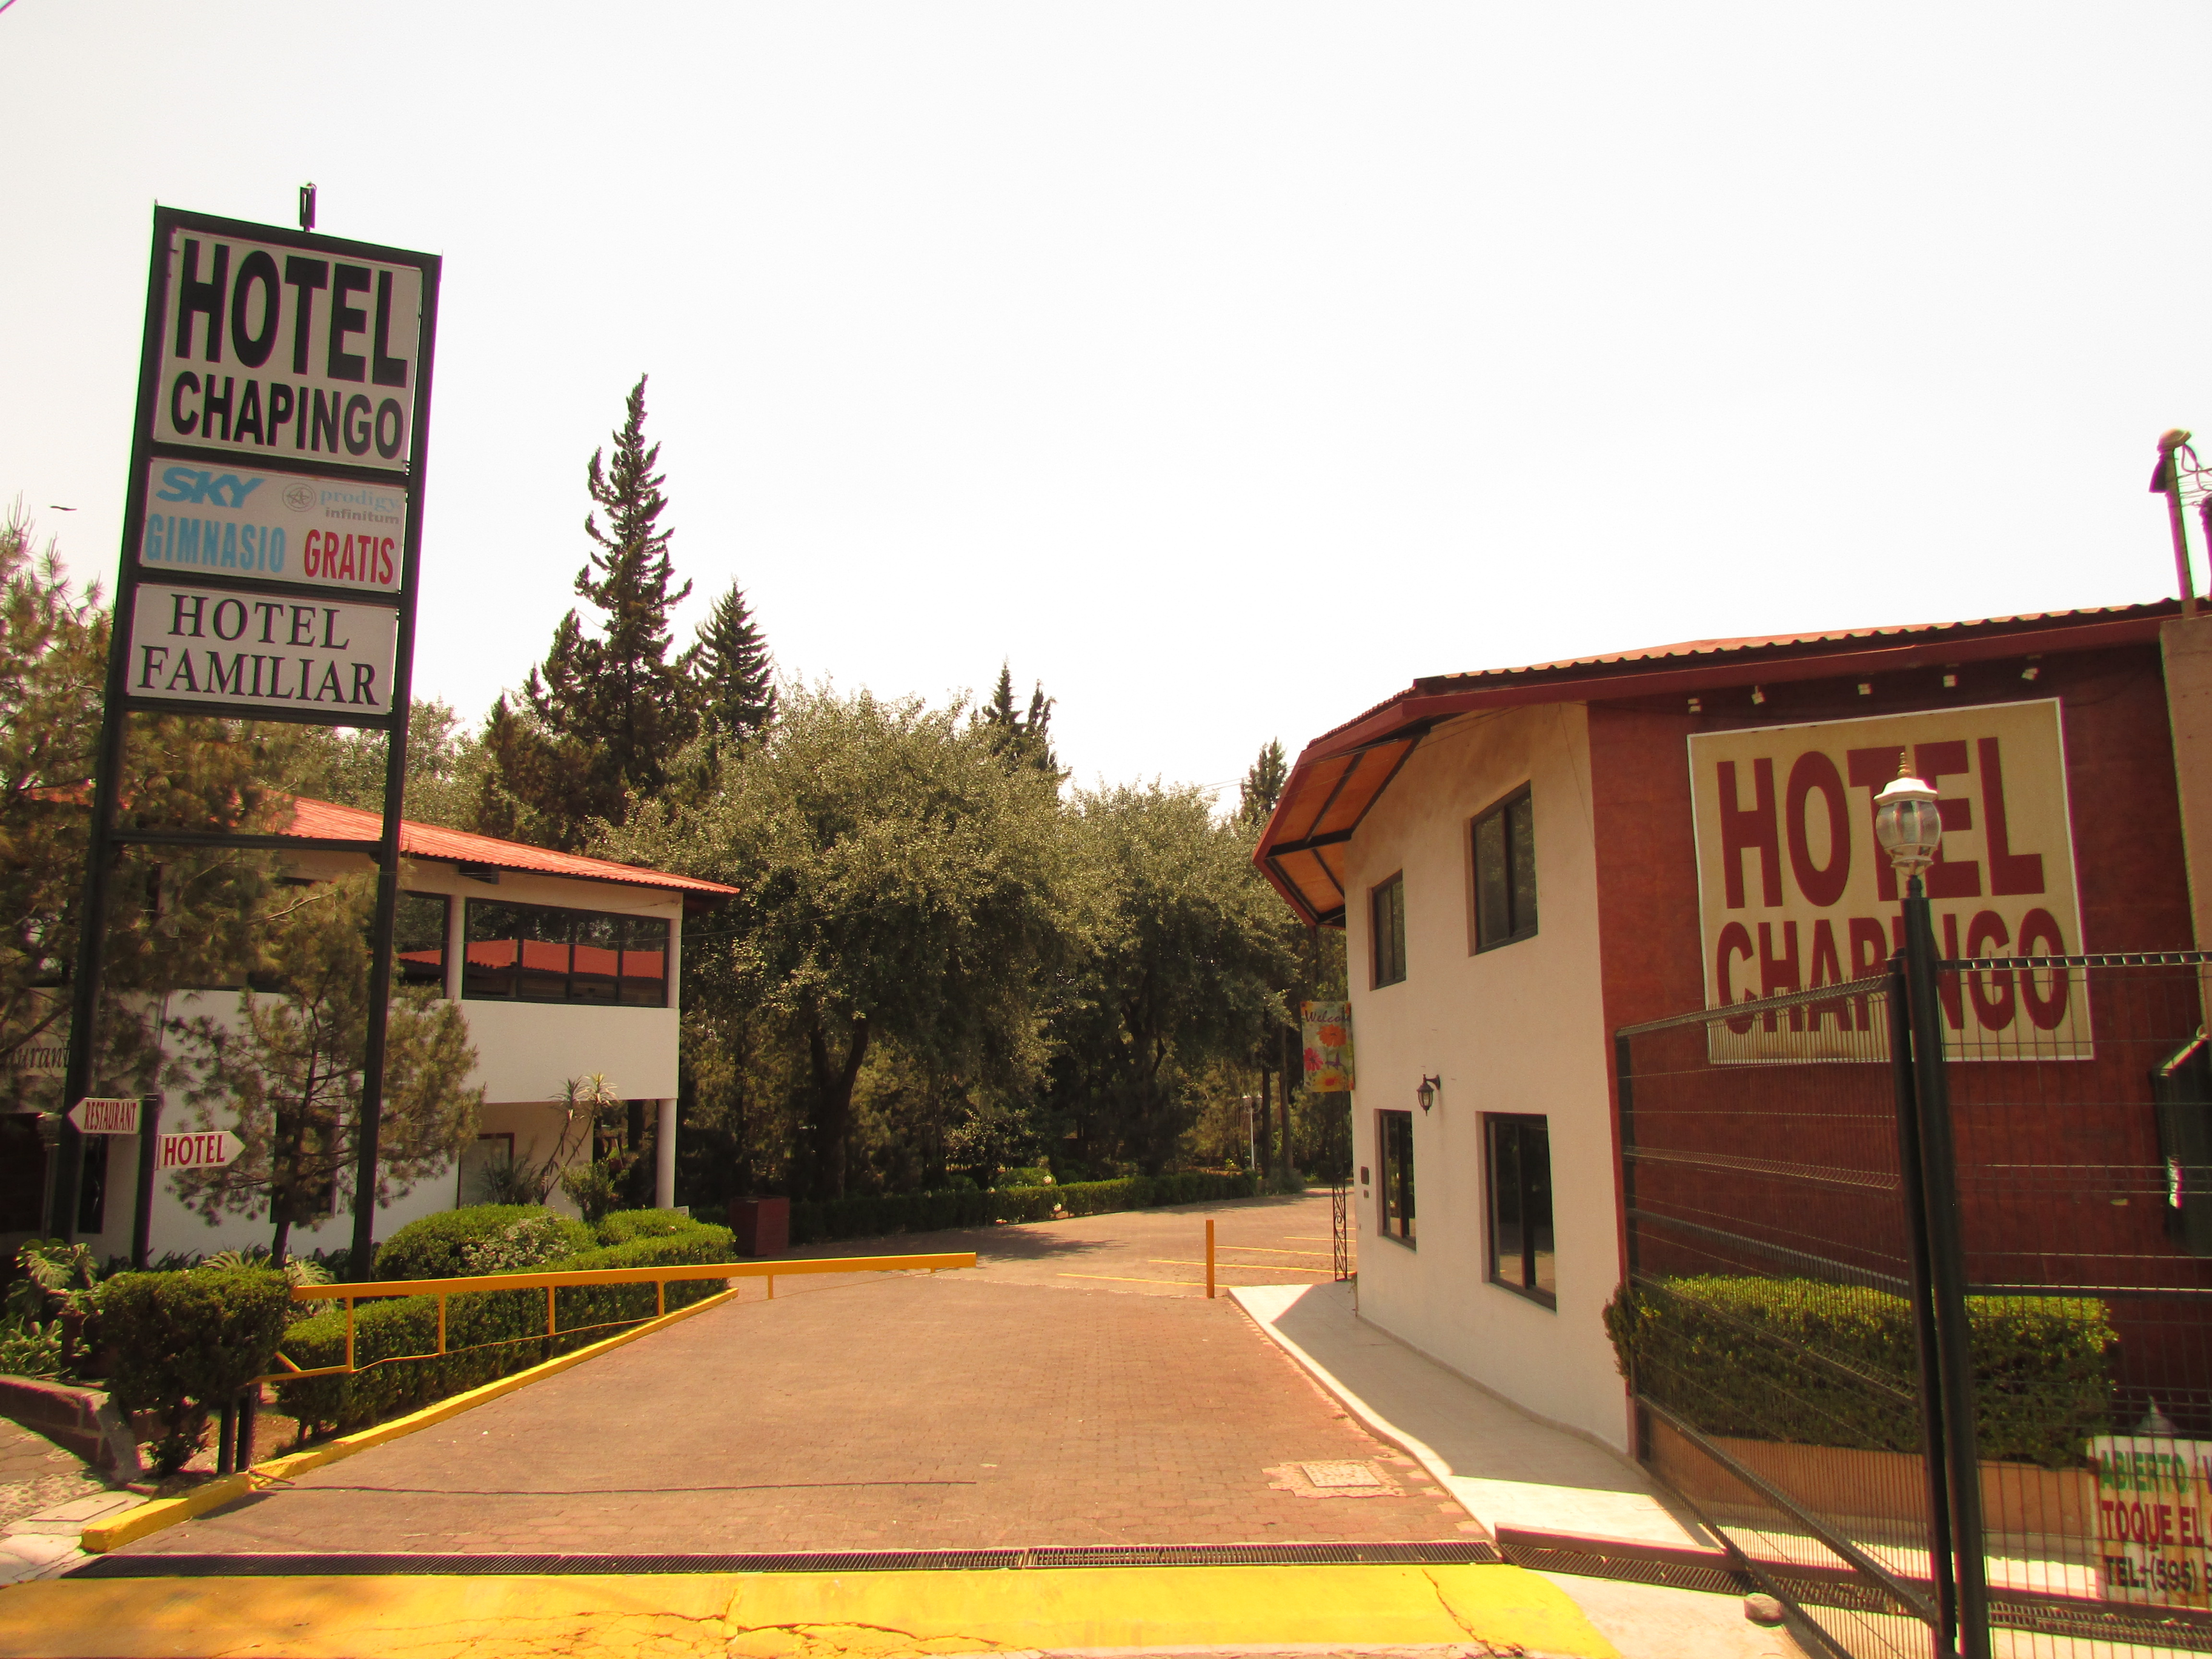 HOTEL CHAPINGO